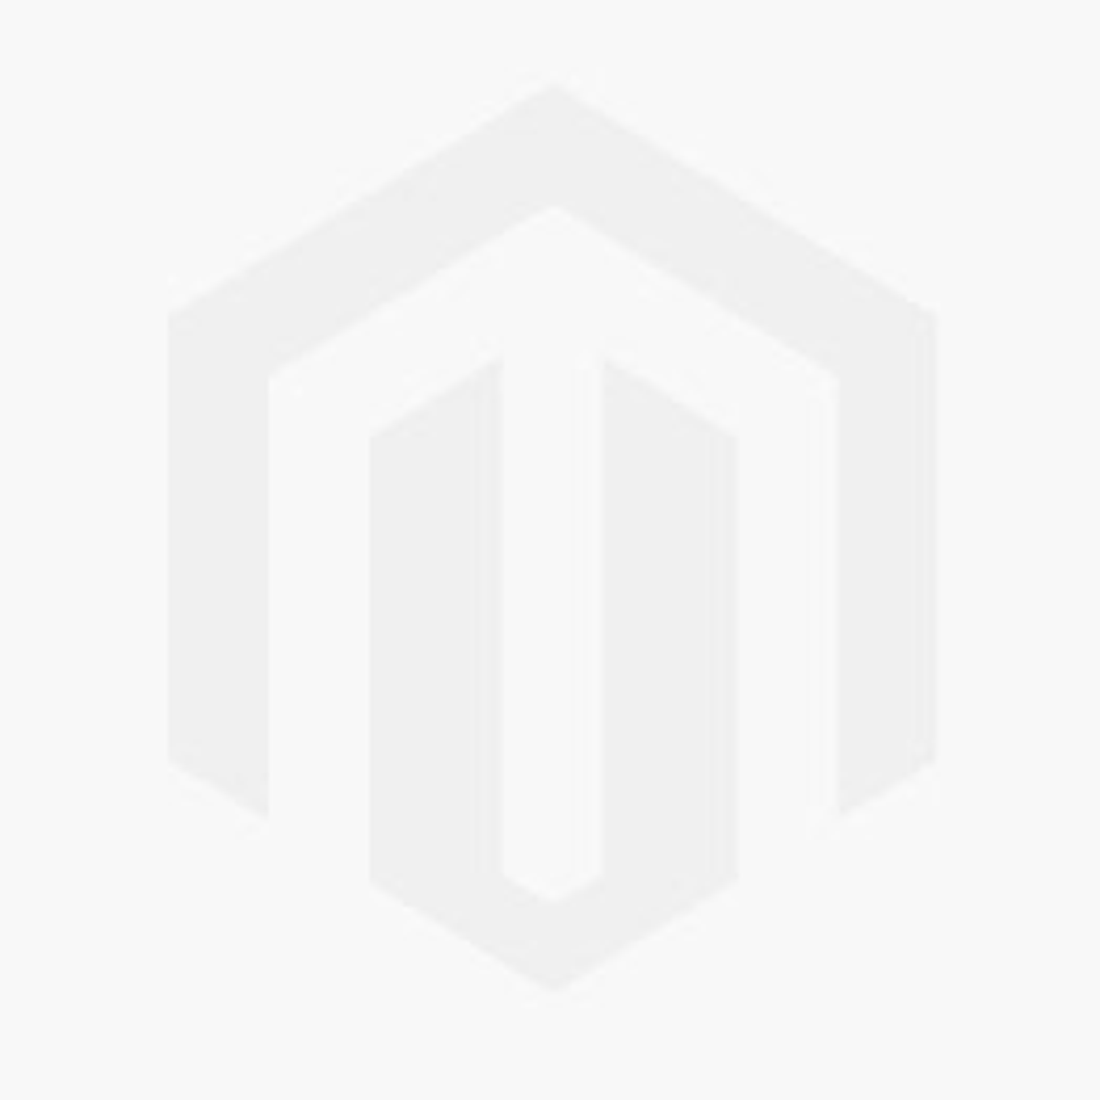 Leon Spilliaert The Mast Repro Print 44 x 62 cm